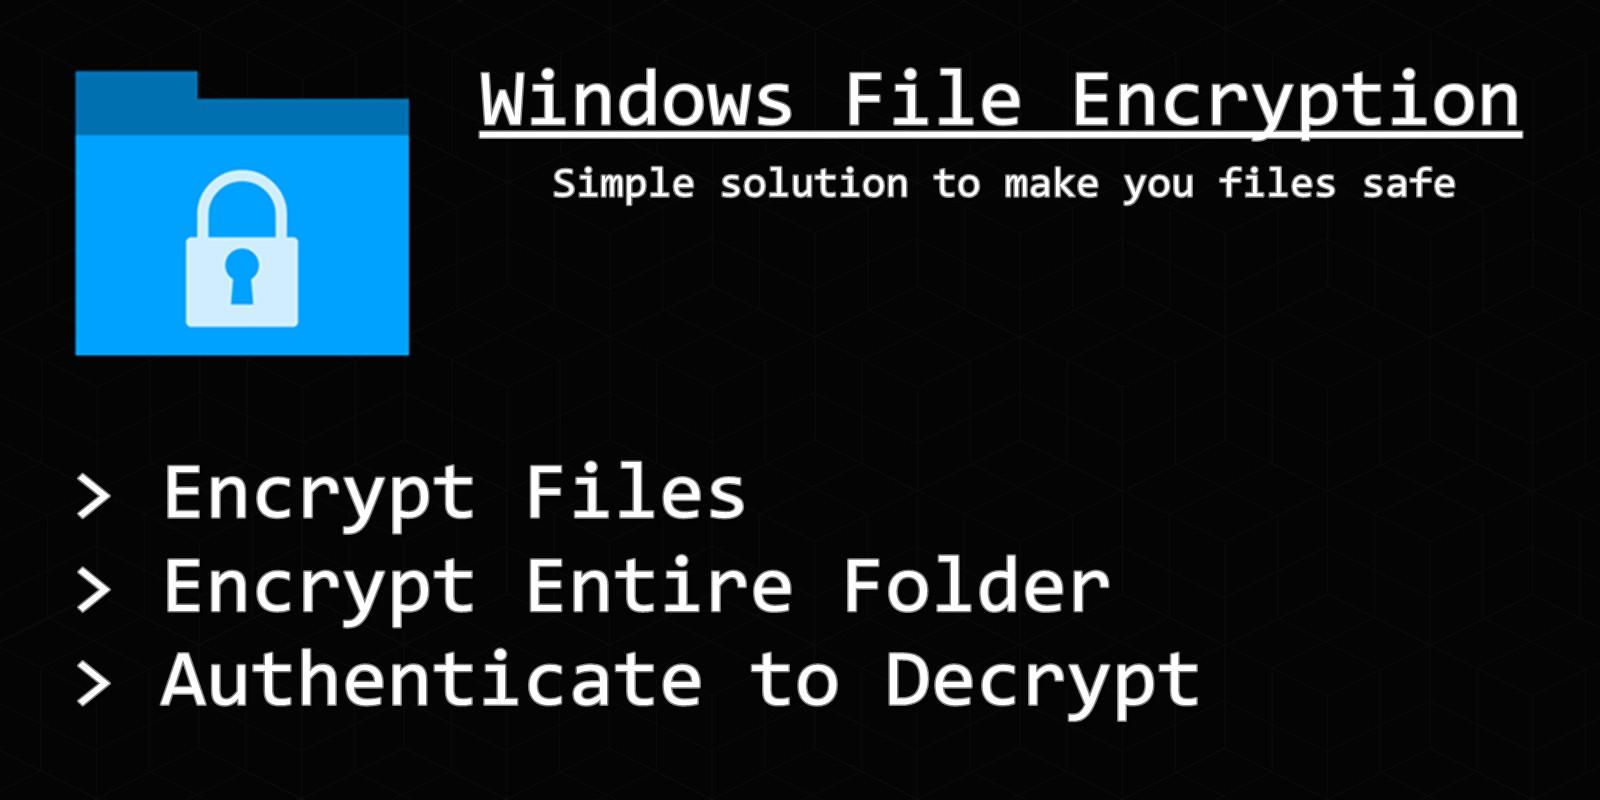 Windows File Encryption C#